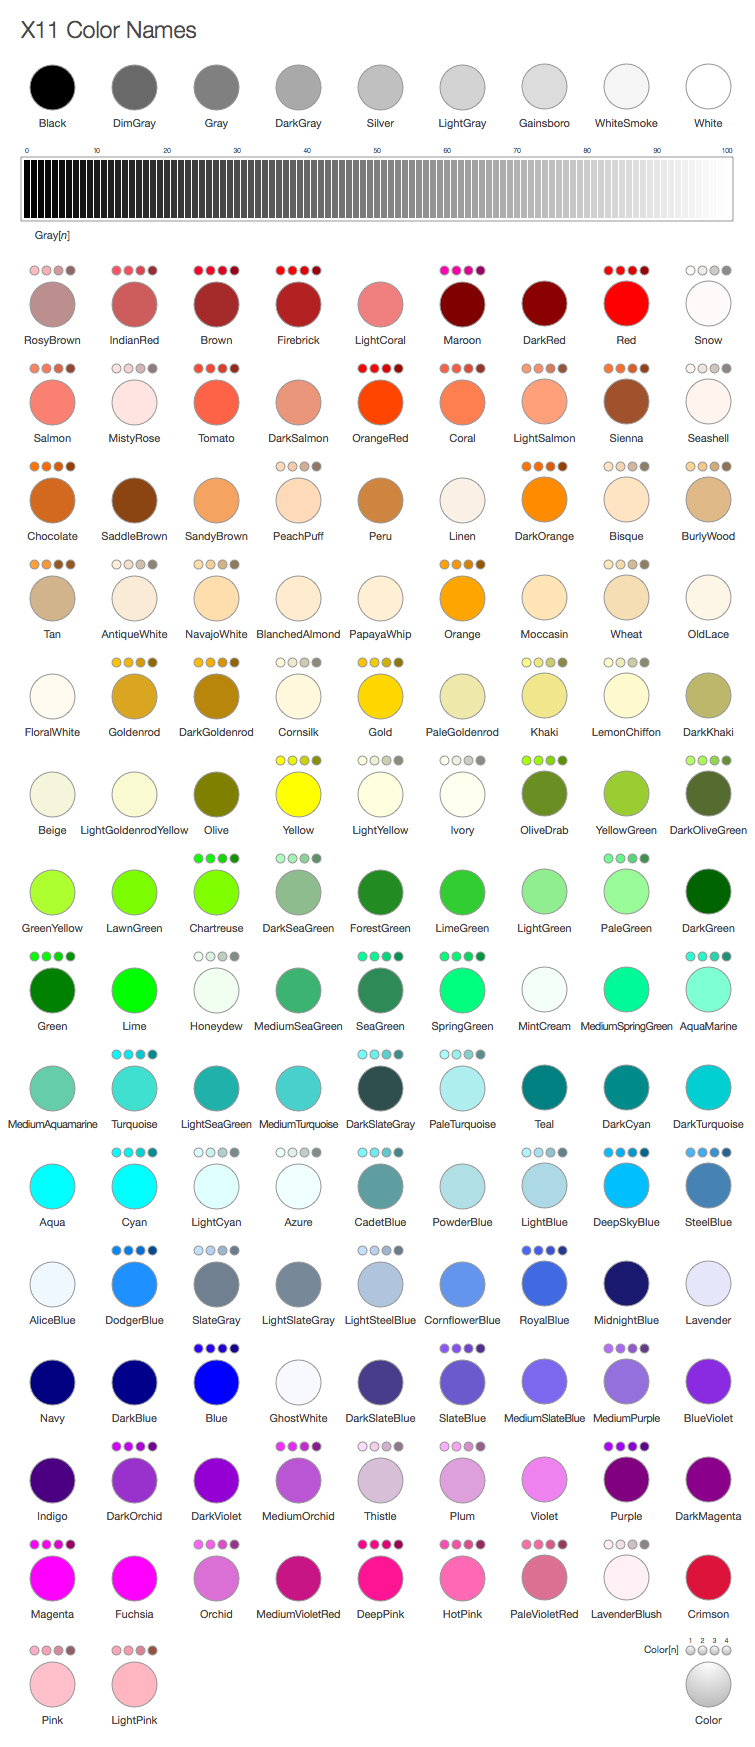 X11 Colors